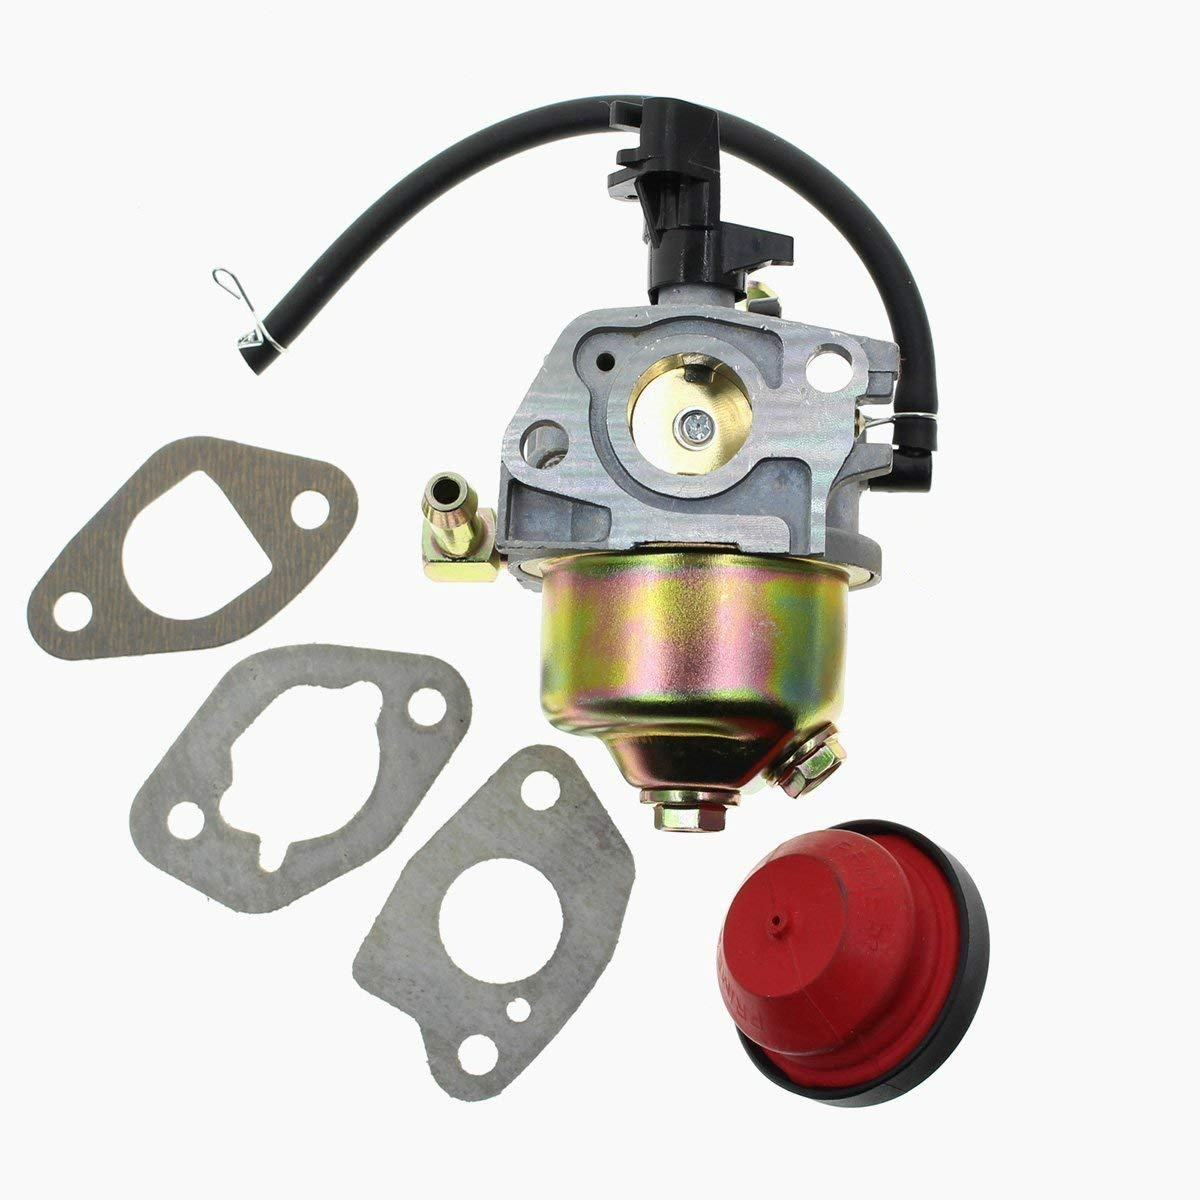 951-11303A High Performance Carburetor for MTD Troy Bilt Cub Cadet 2 Stage Snow blowers #951-10974,951-10974A,951-12705 951-14023A